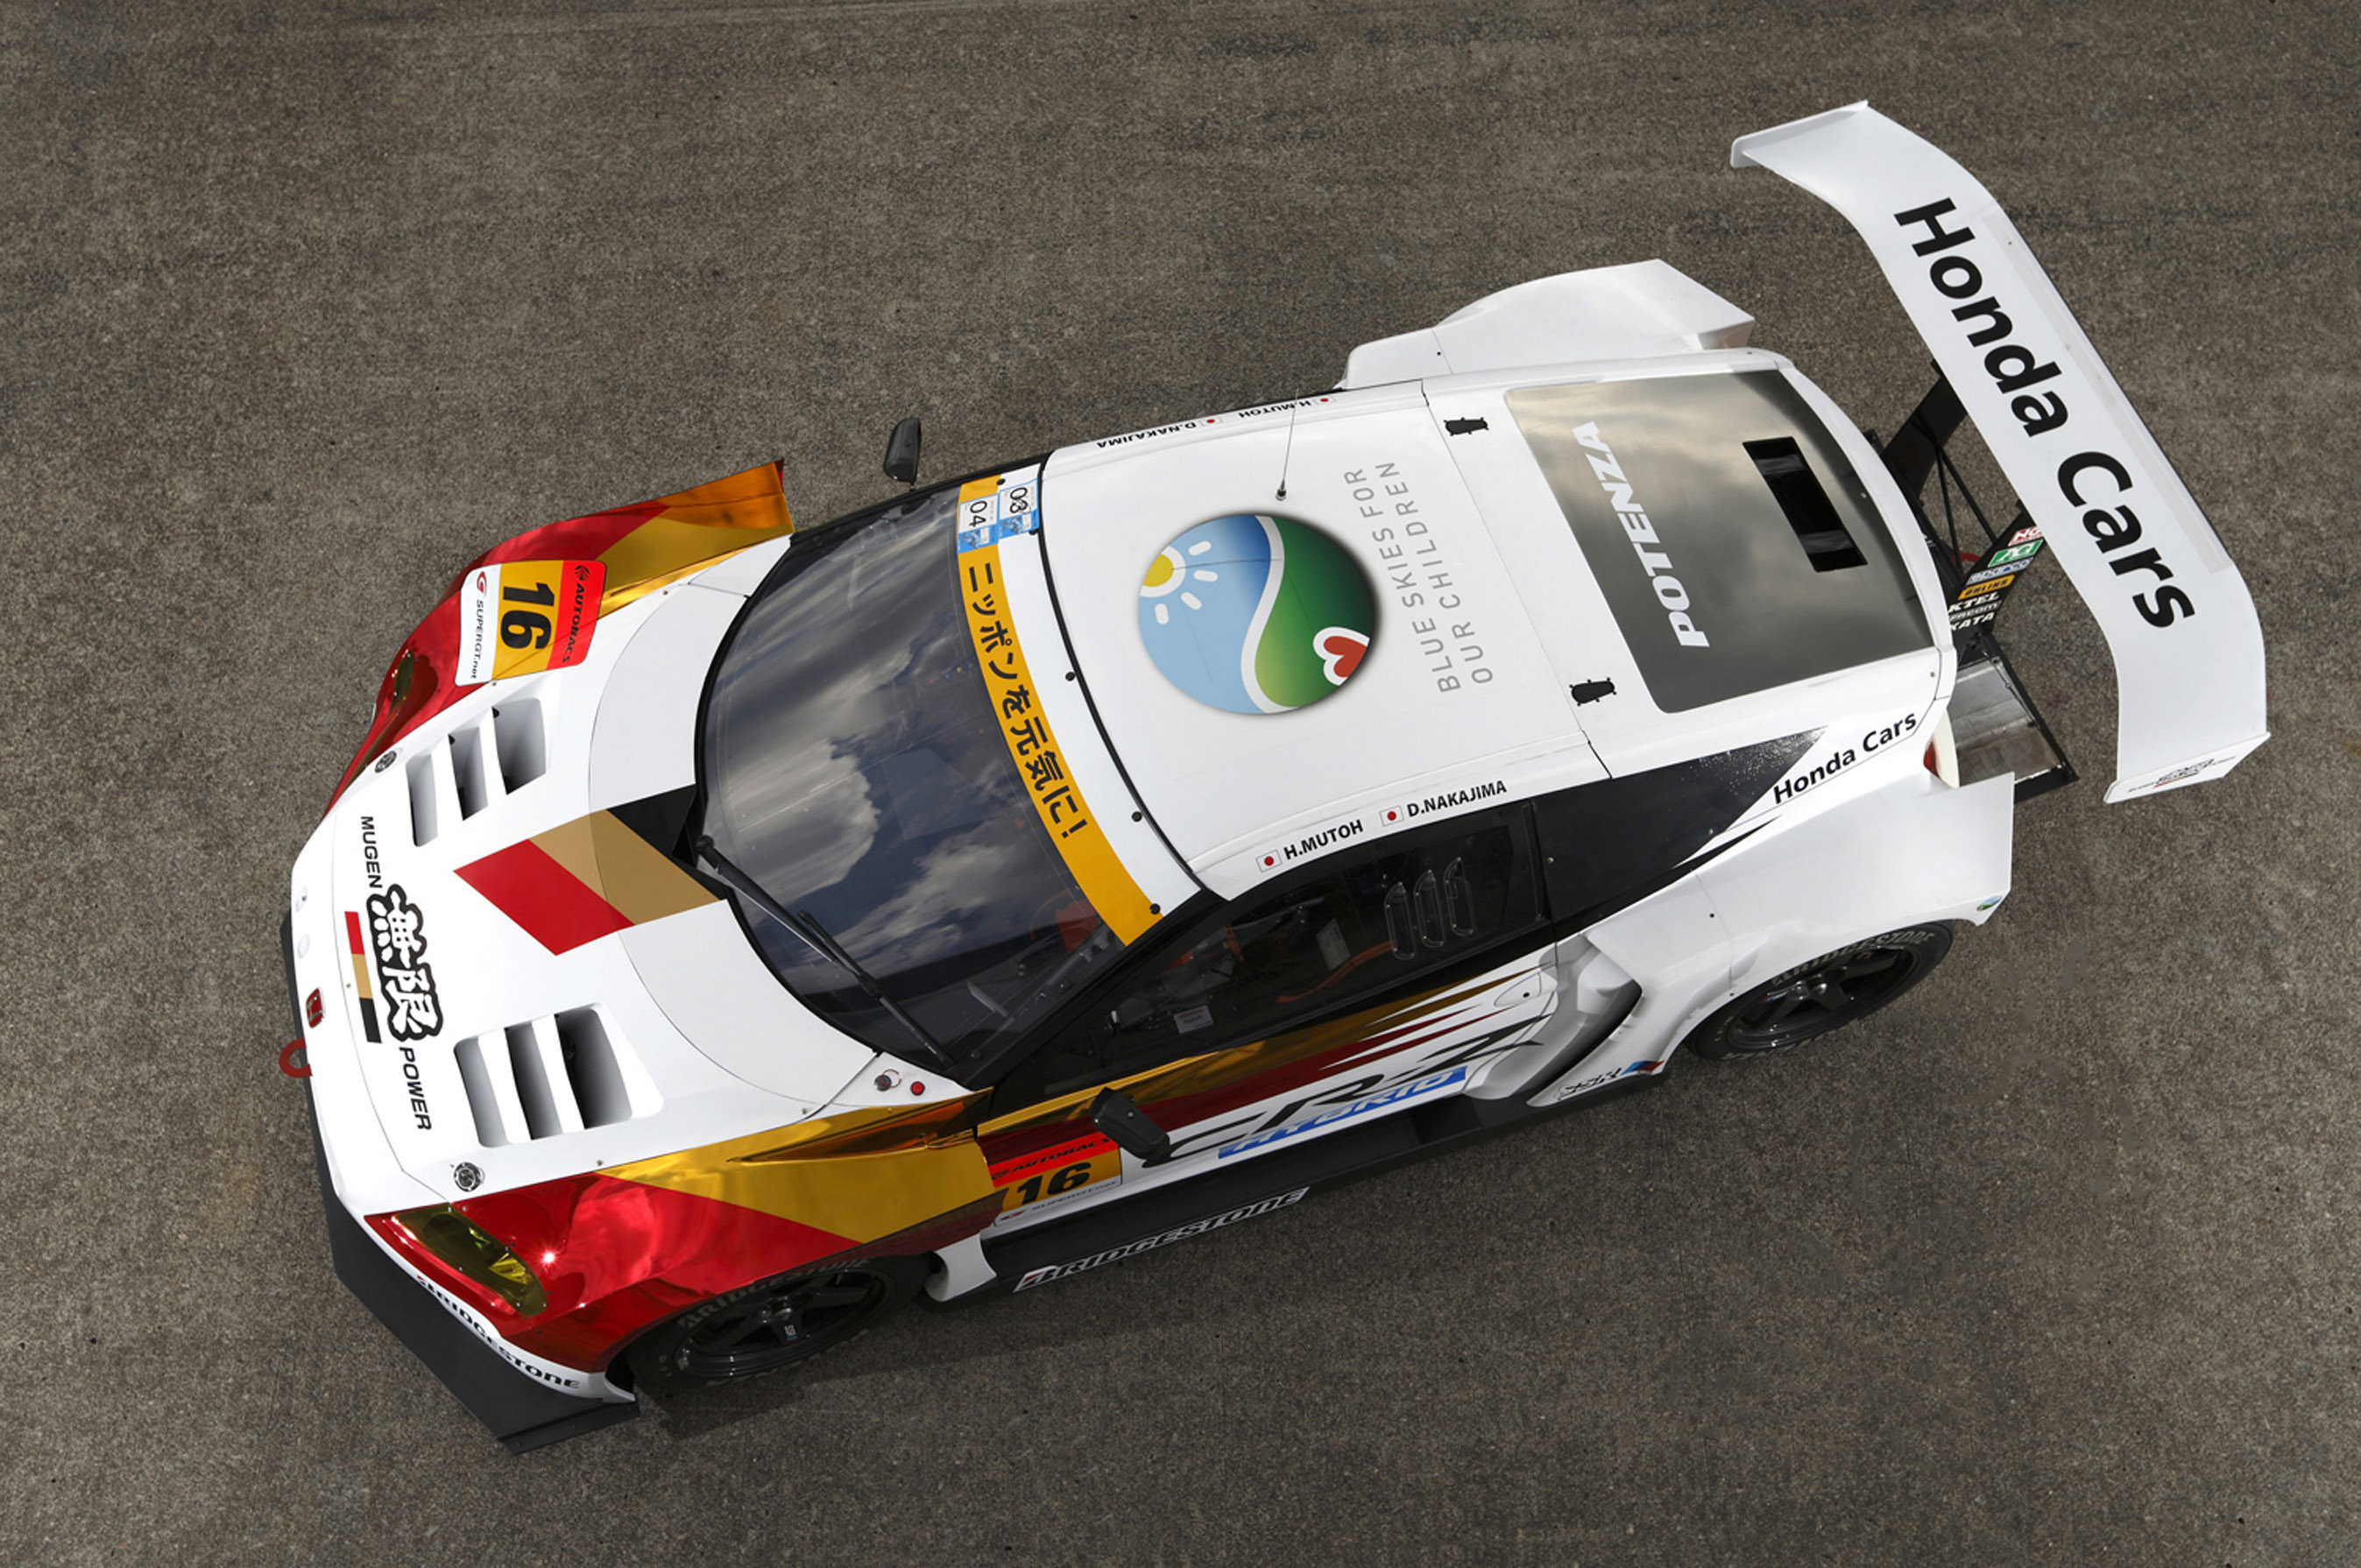 Mugen Honda Cr Z Gt Racing Car Picture 70820